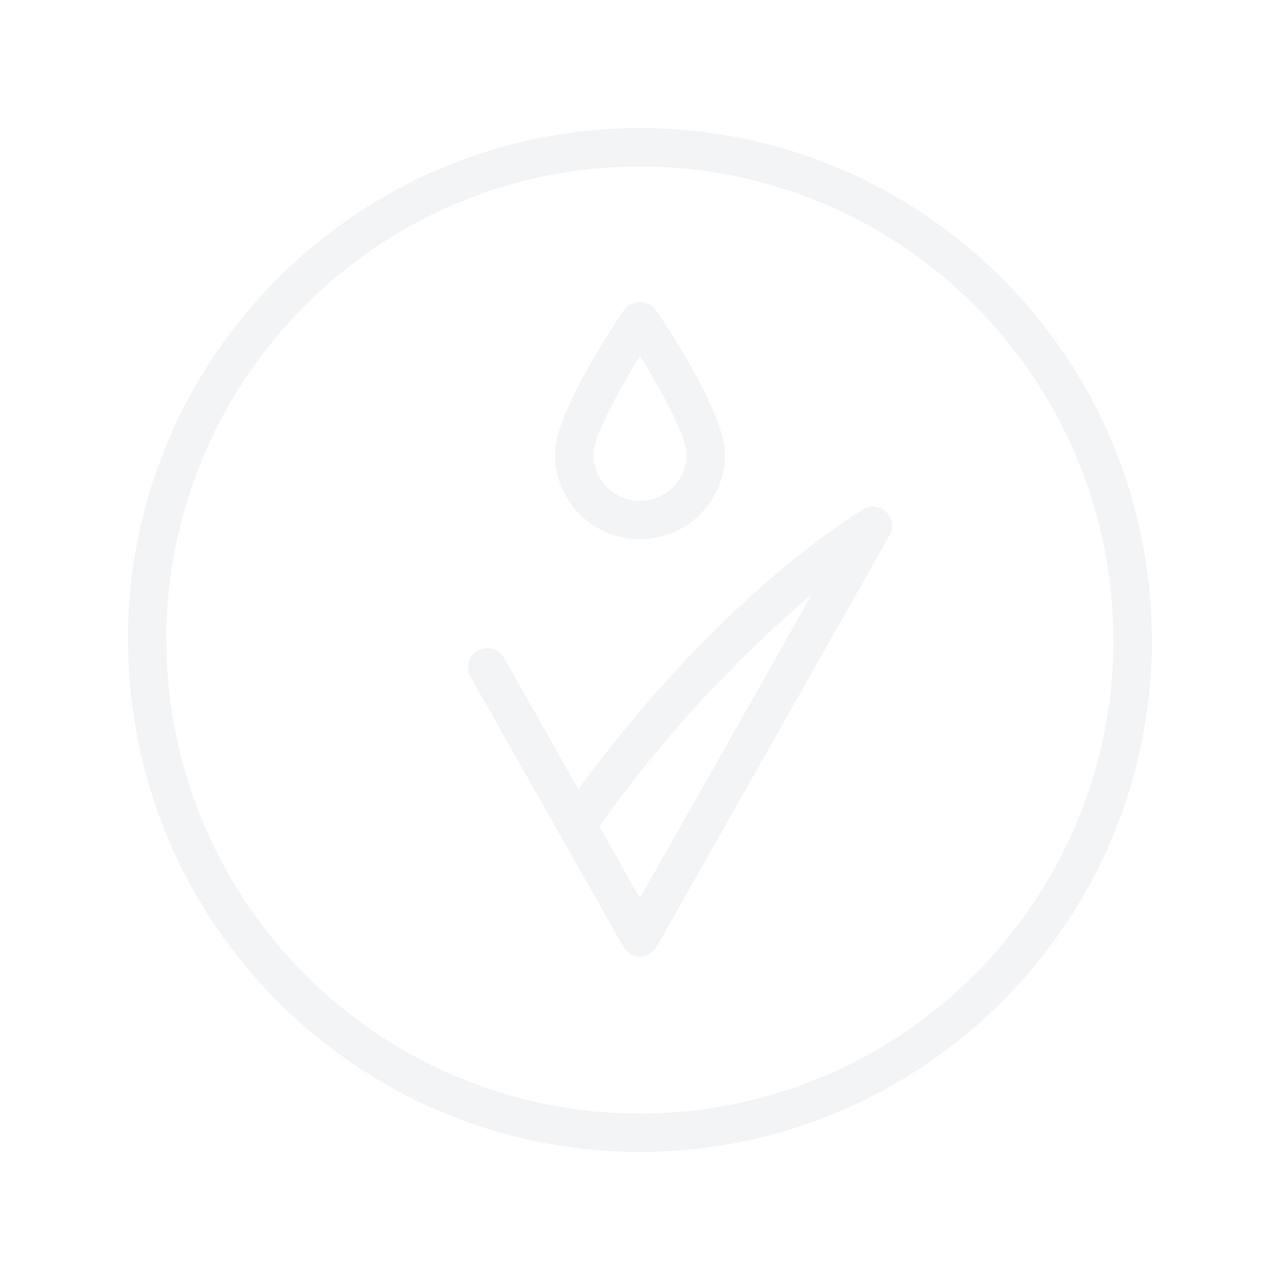 BIOTHERM Aquasource Cream (Dry Skin) 50ml